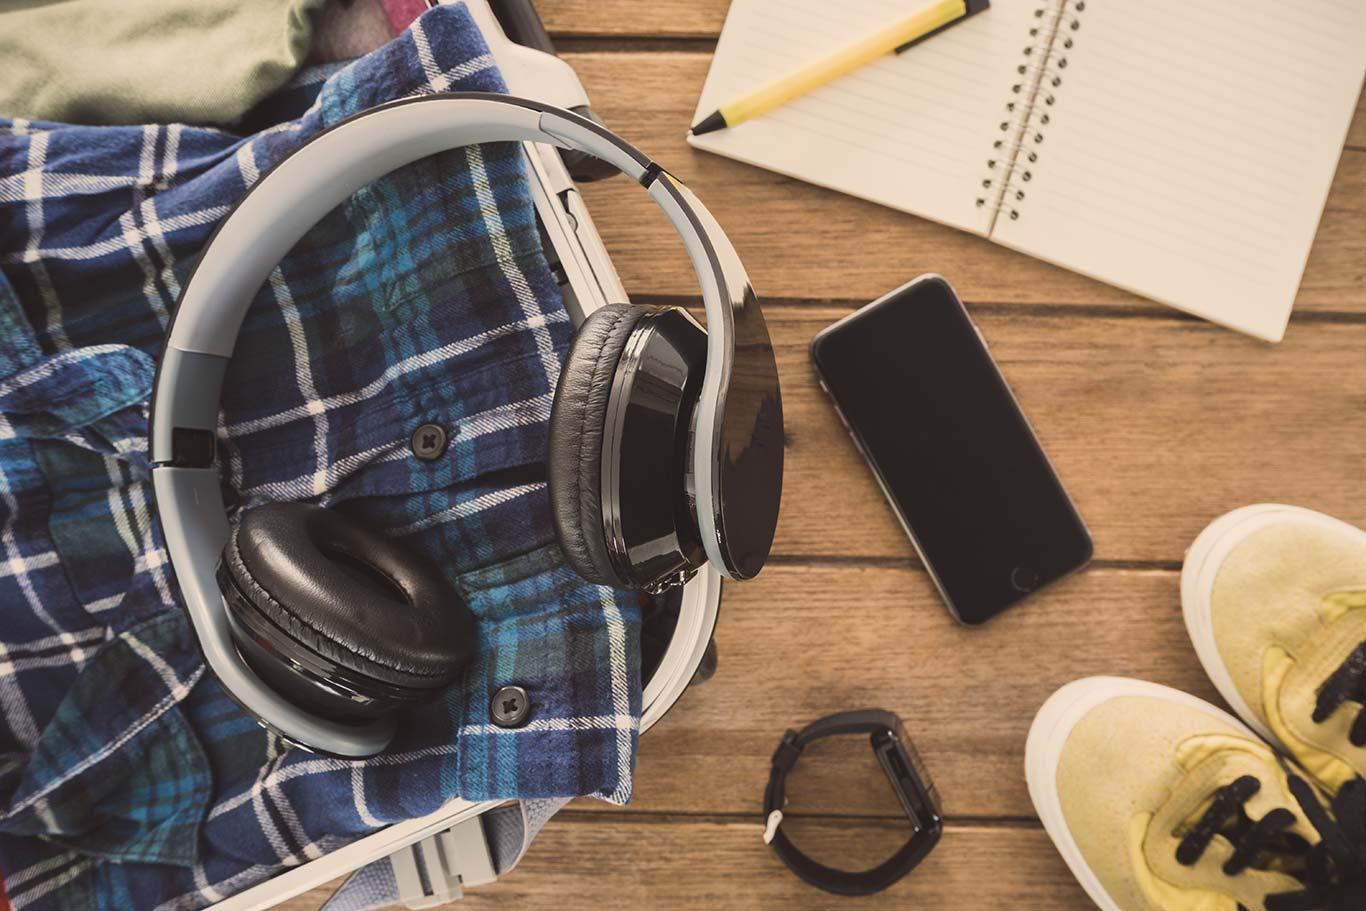 Boomers Versus Millennials blog post 1 pic 2